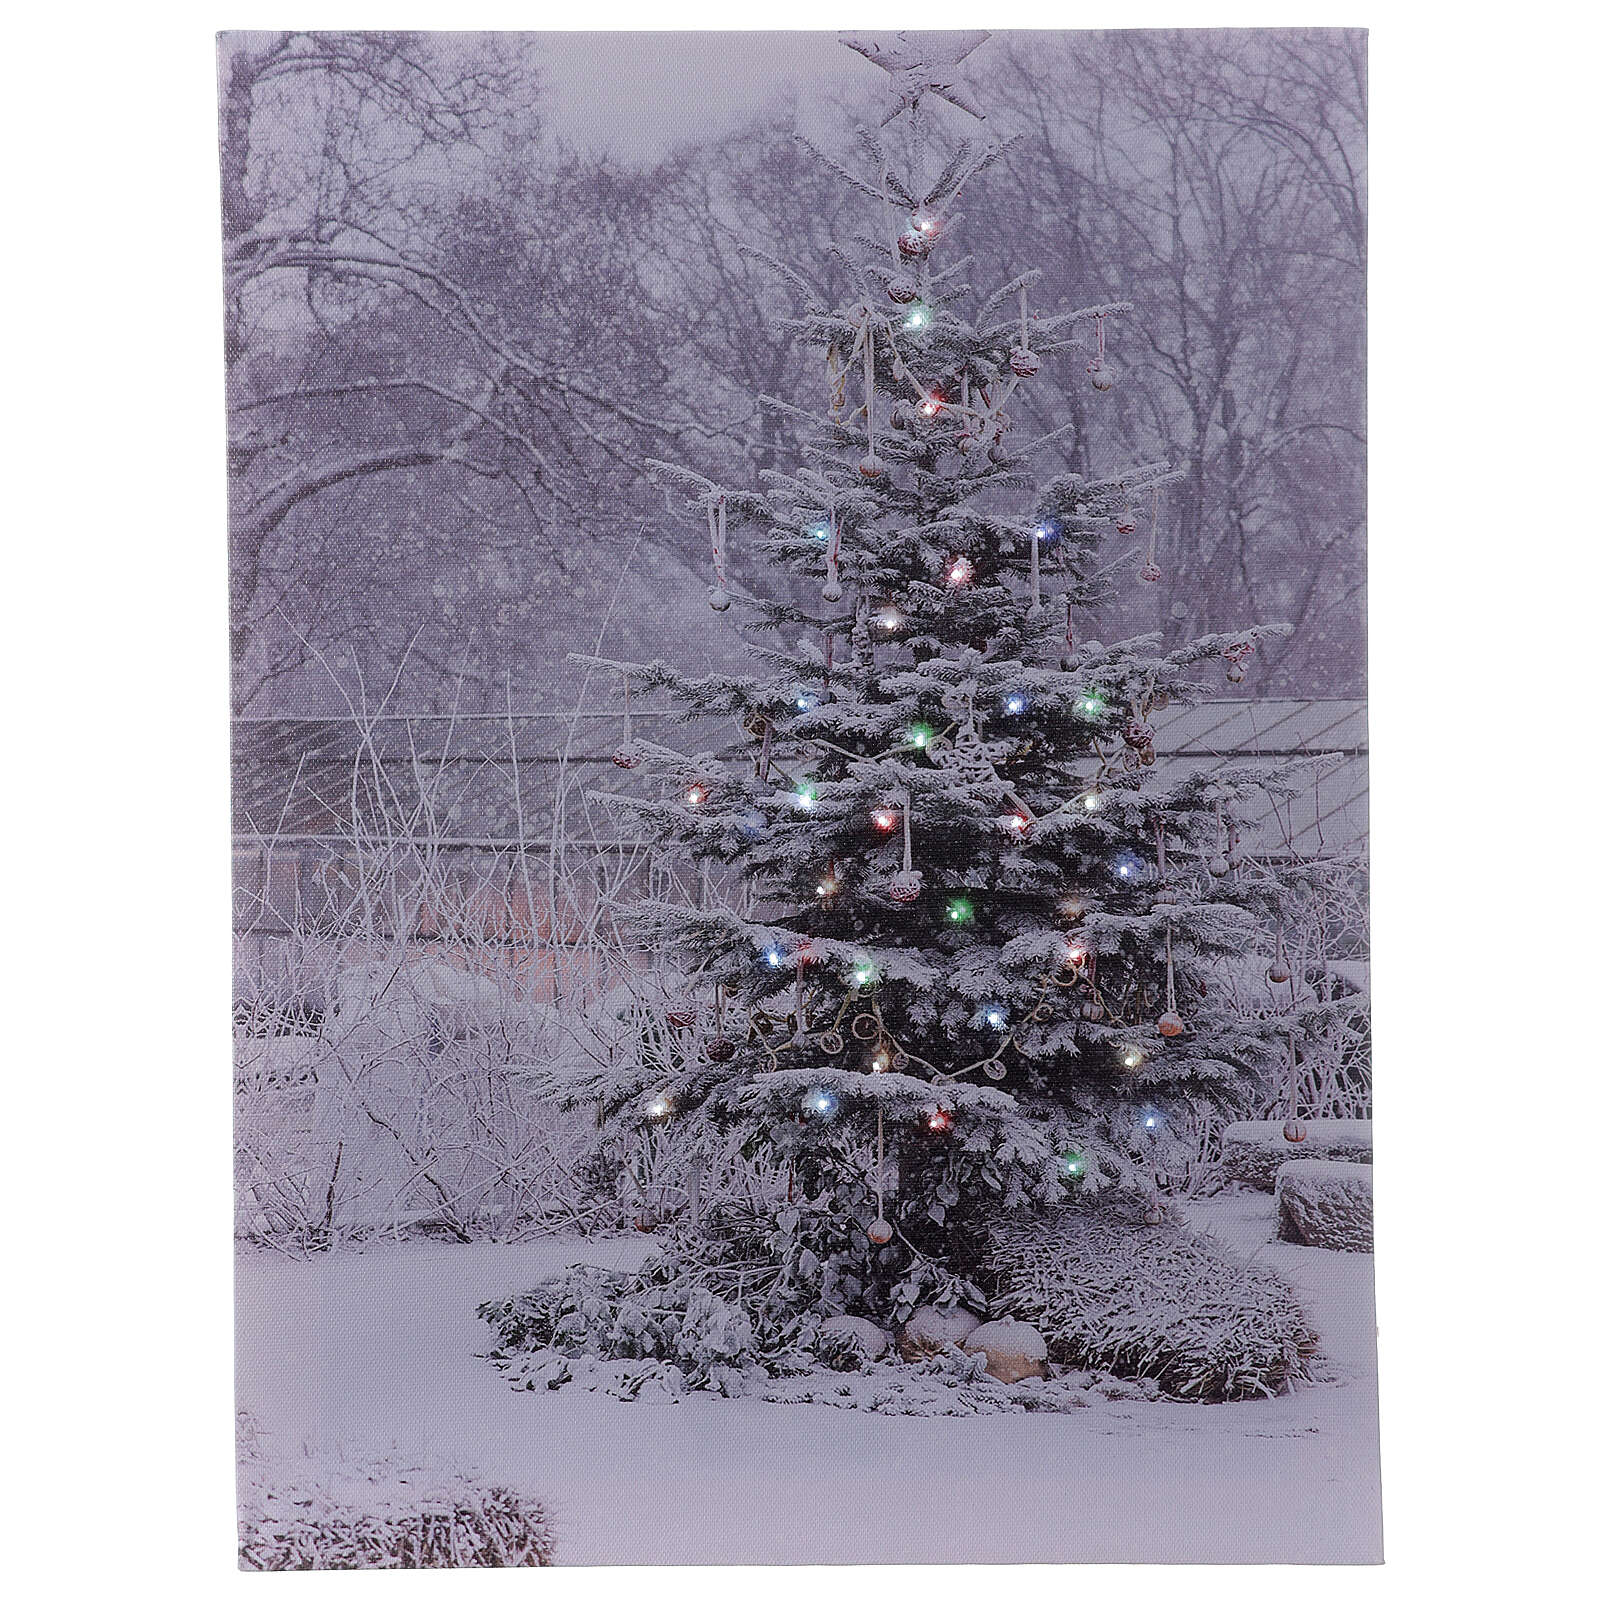 Snowy Christmas tree picture frame fiber optic 40x30 cm 3